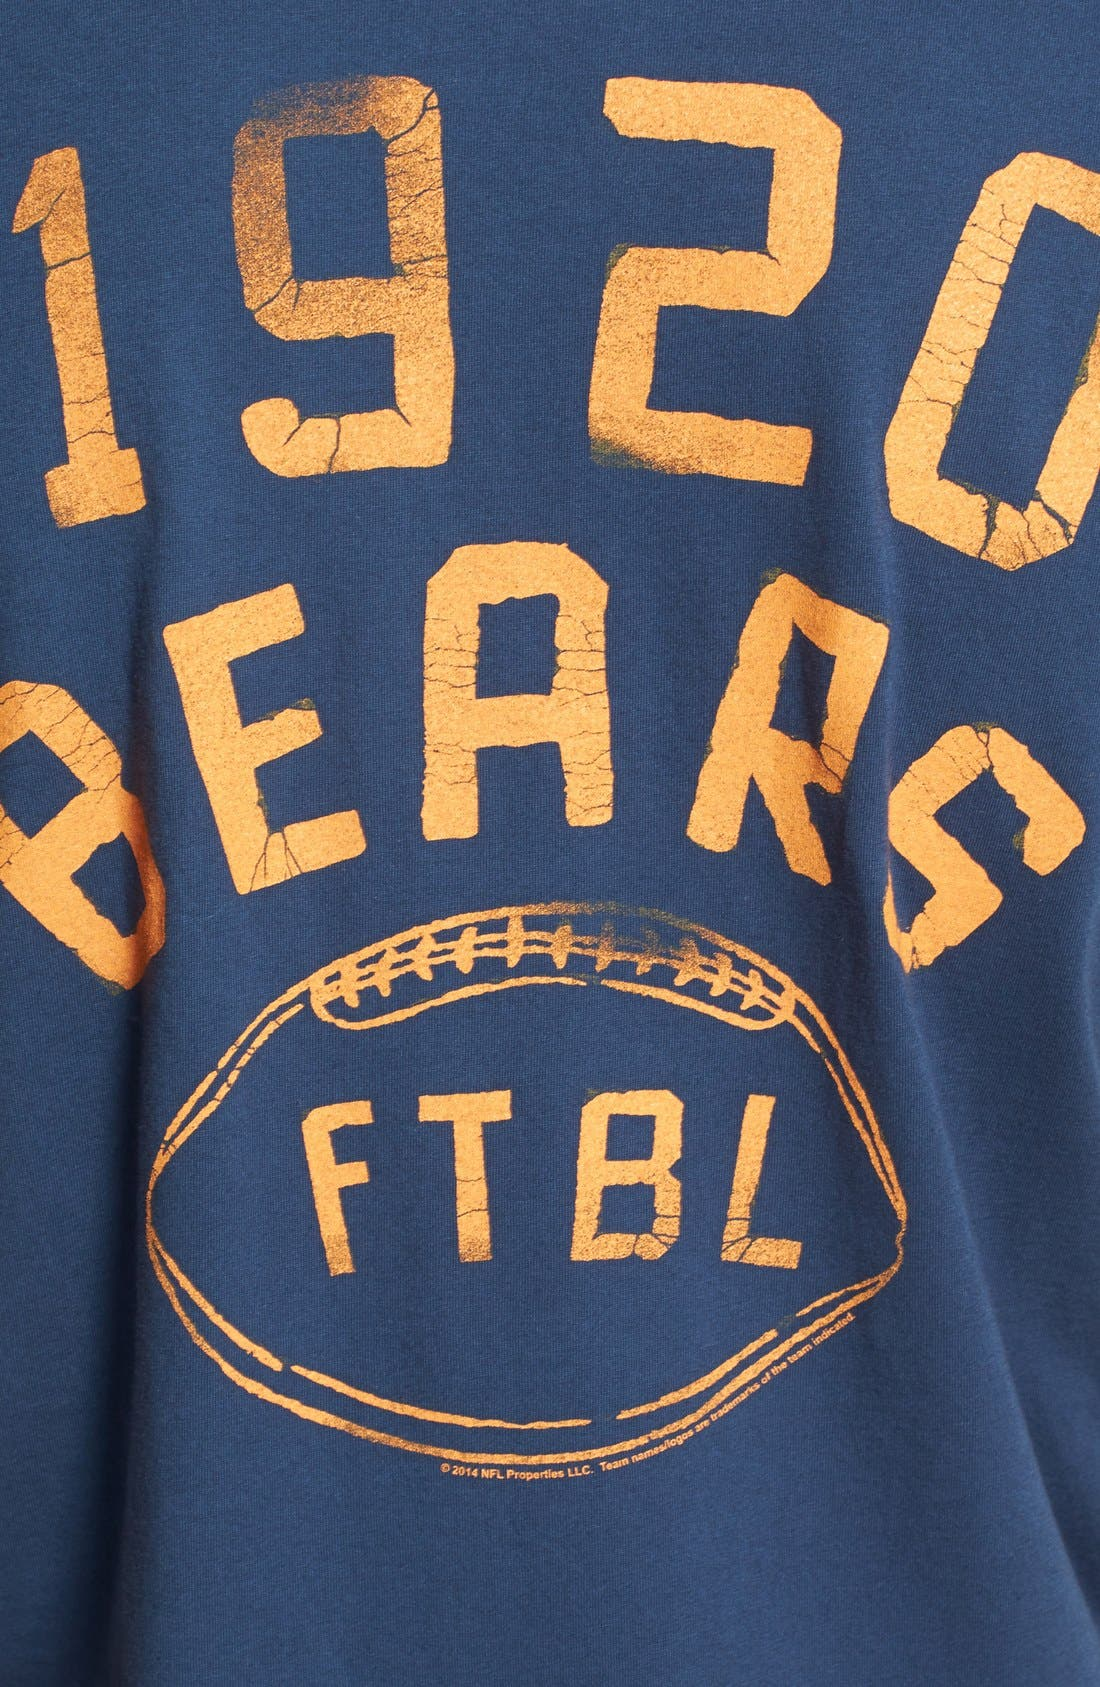 Alternate Image 3  - Junk Food 'Chicago Bears' Graphic T-Shirt